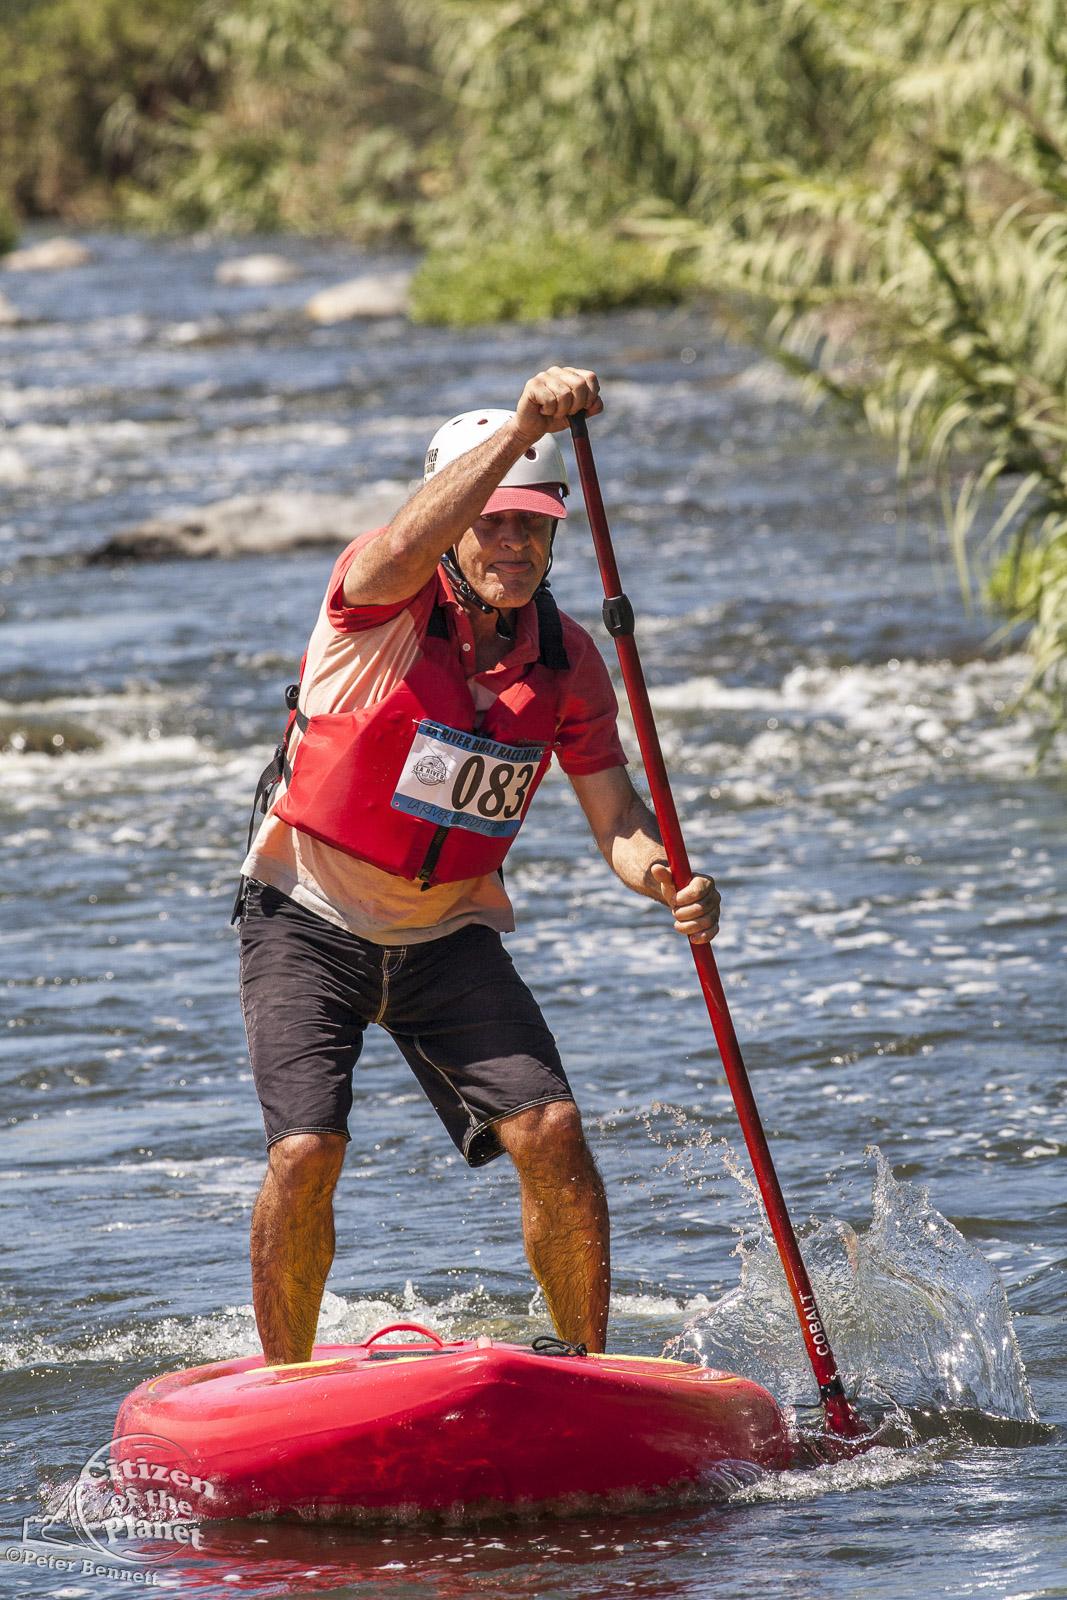 US_CA_48_3870_la_river_boat_race.jpg